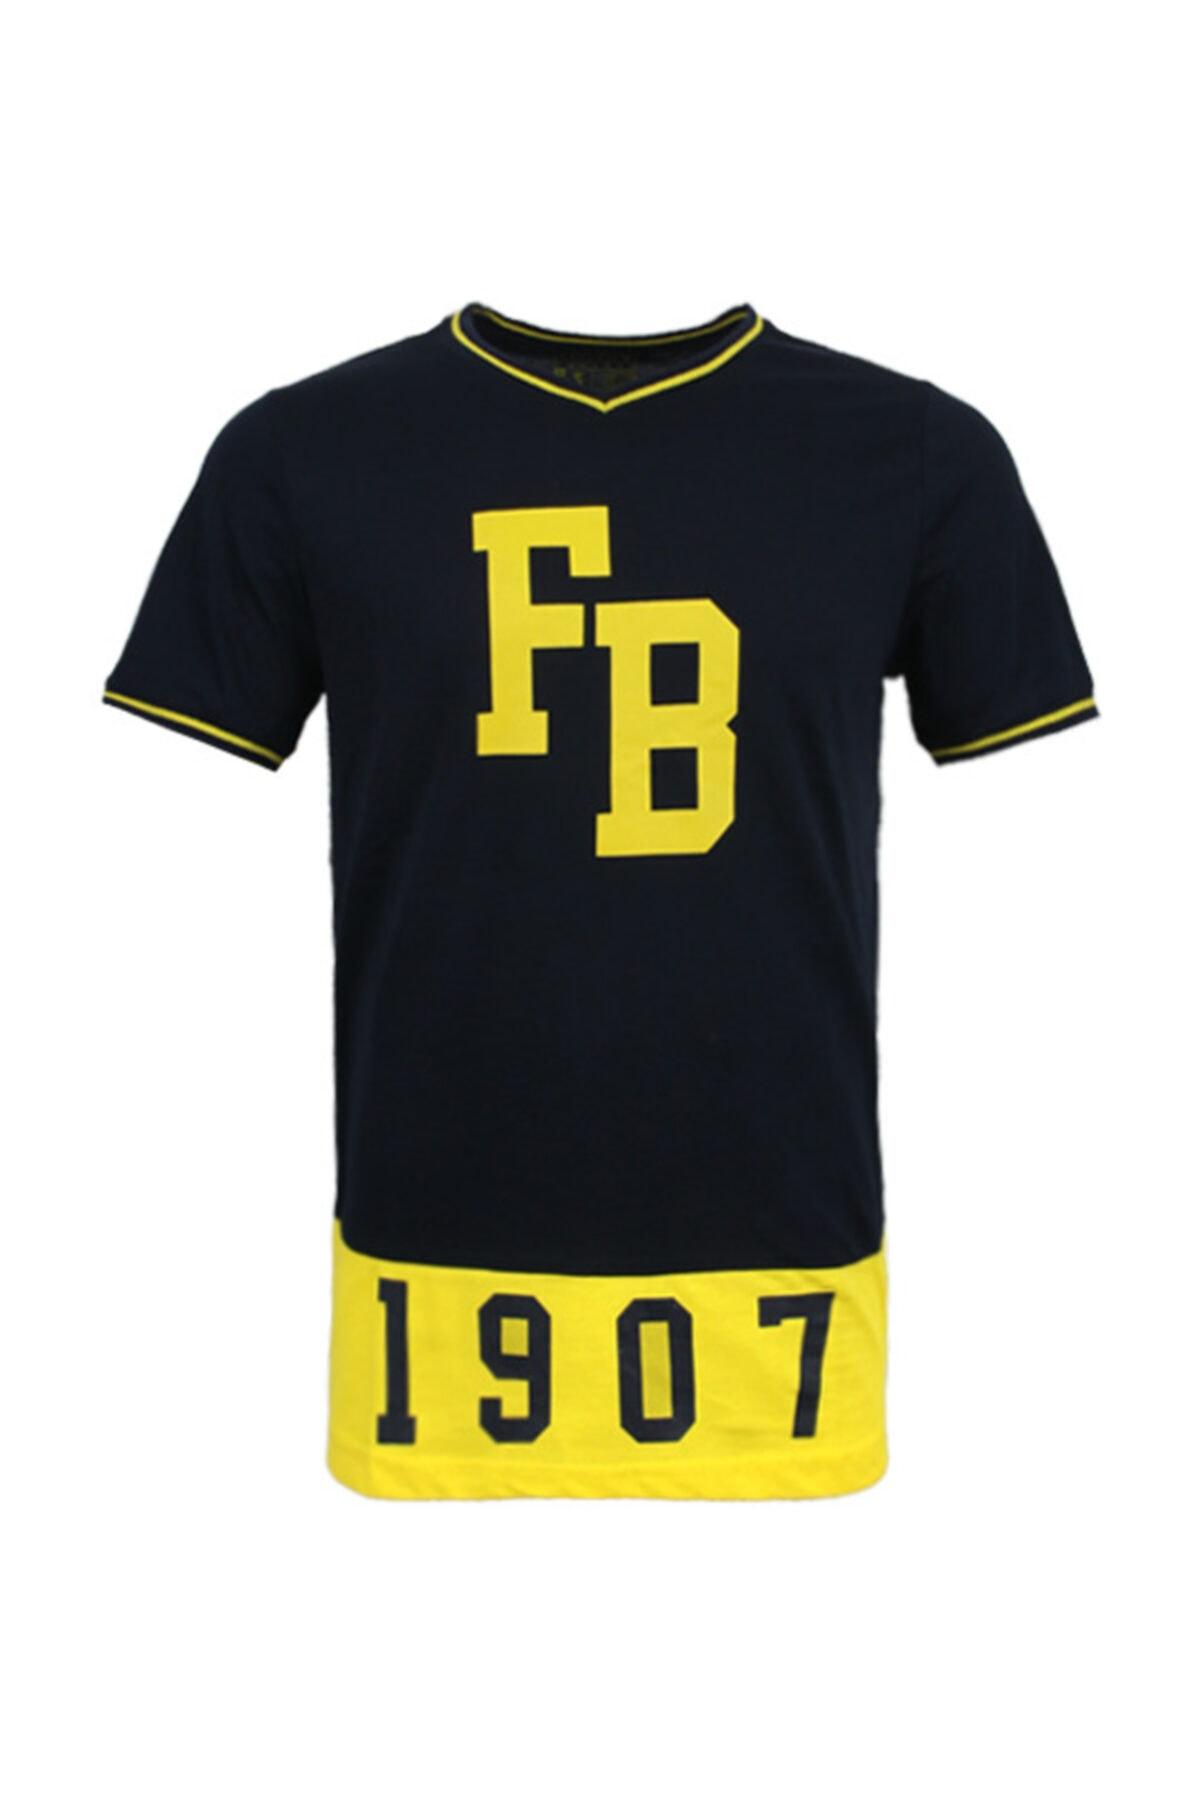 Fenerbahçe Erkek Lacivert Kolej 1907  Spor T-Shirt 1